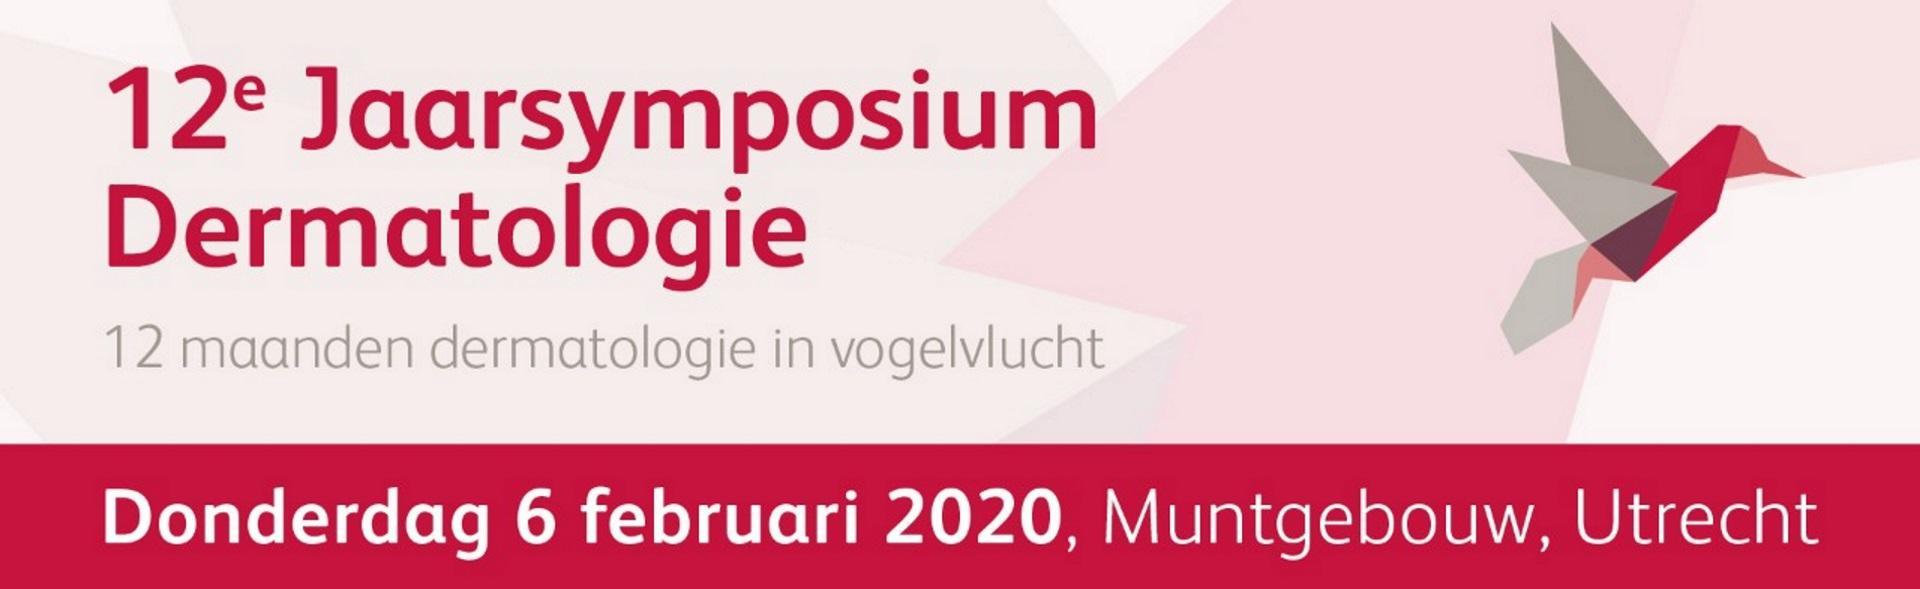 Jaarsymposium dermatologie 2020